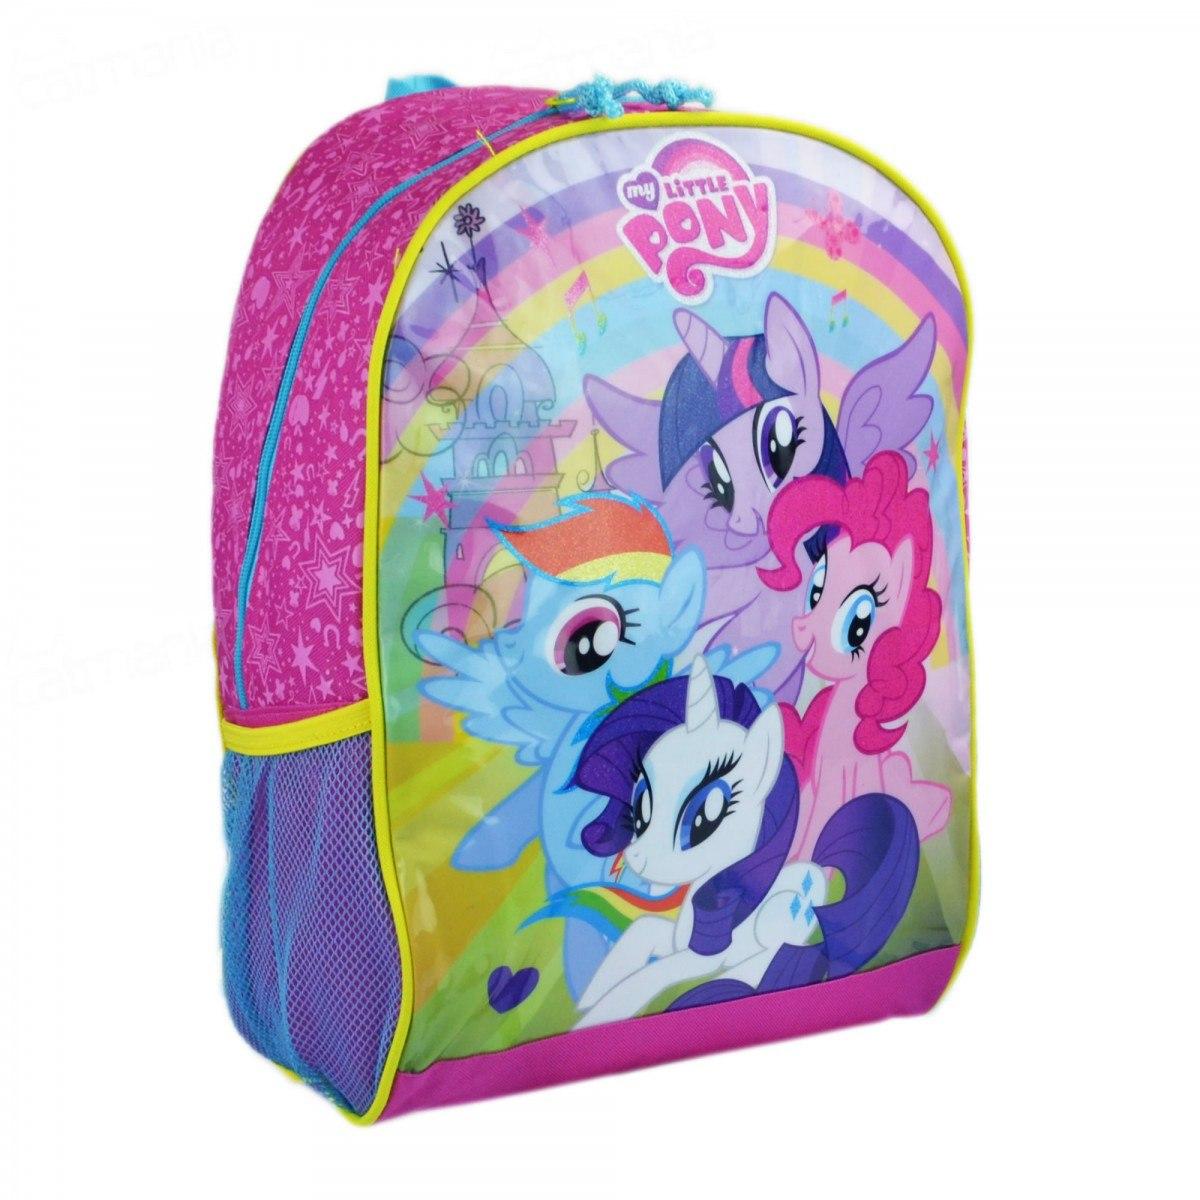 Pony 48786Catmania My My Little Little Mochila Mochila OPuTZikX